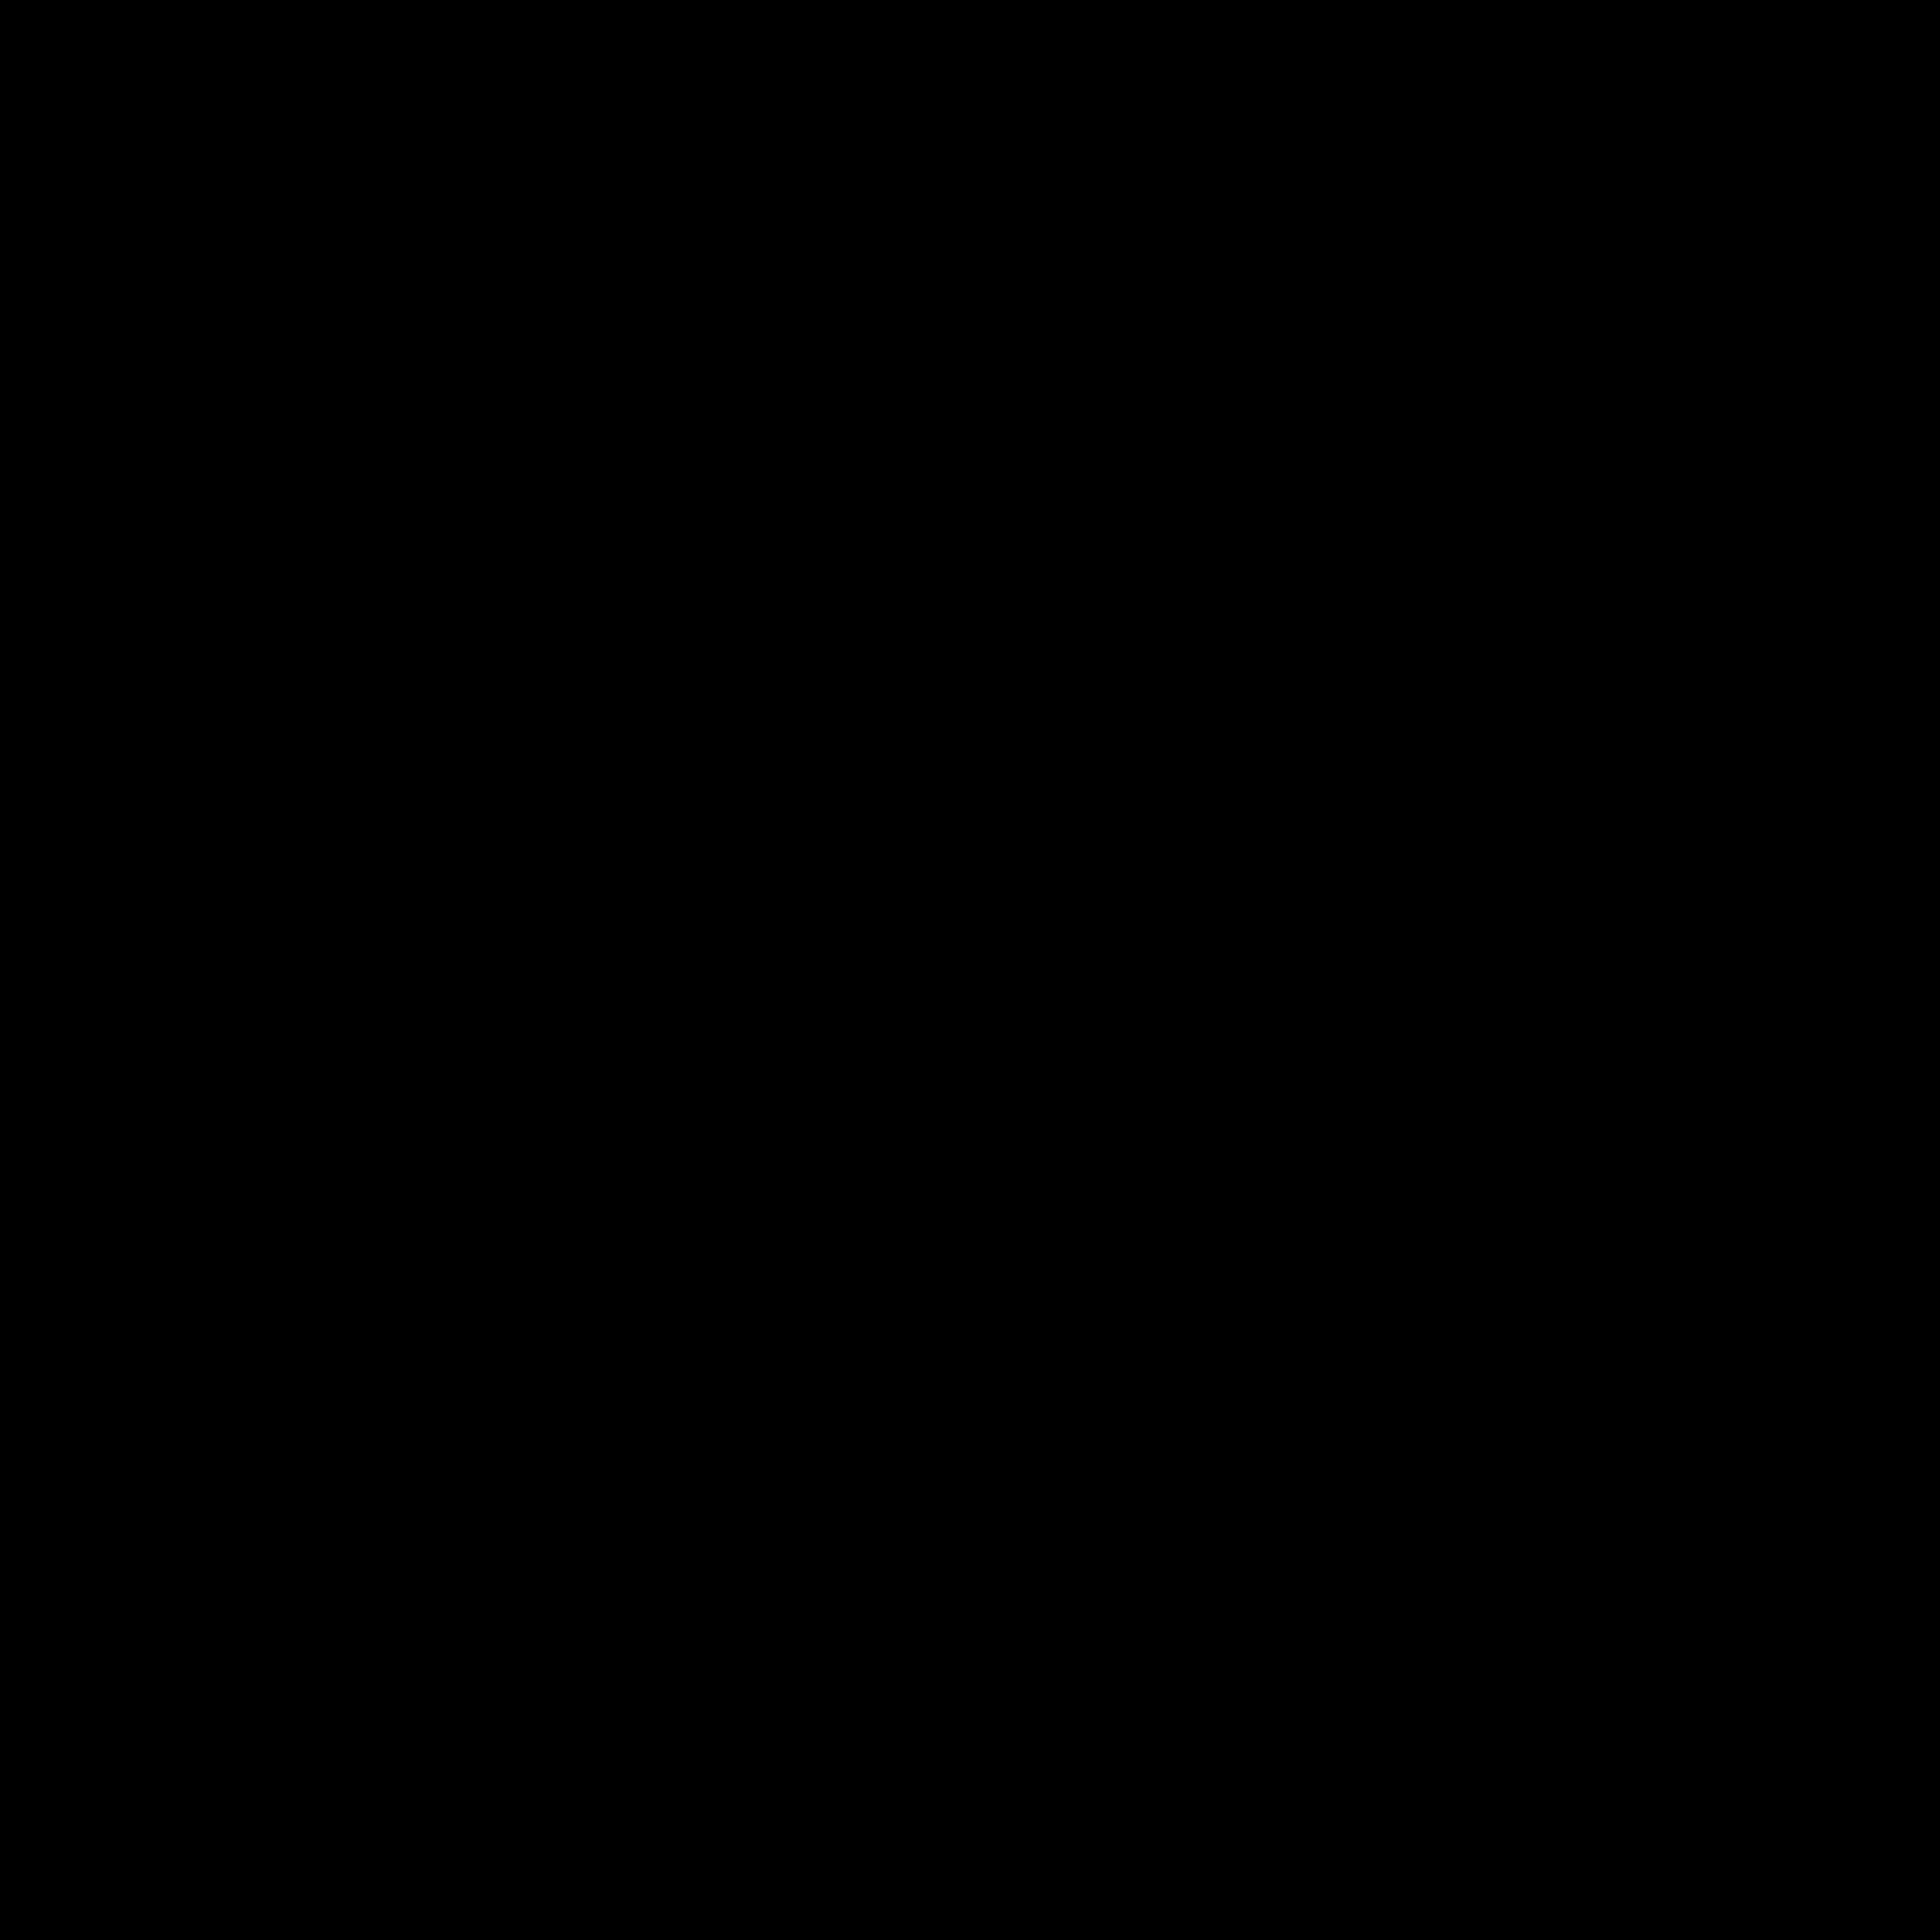 Coder Clipart